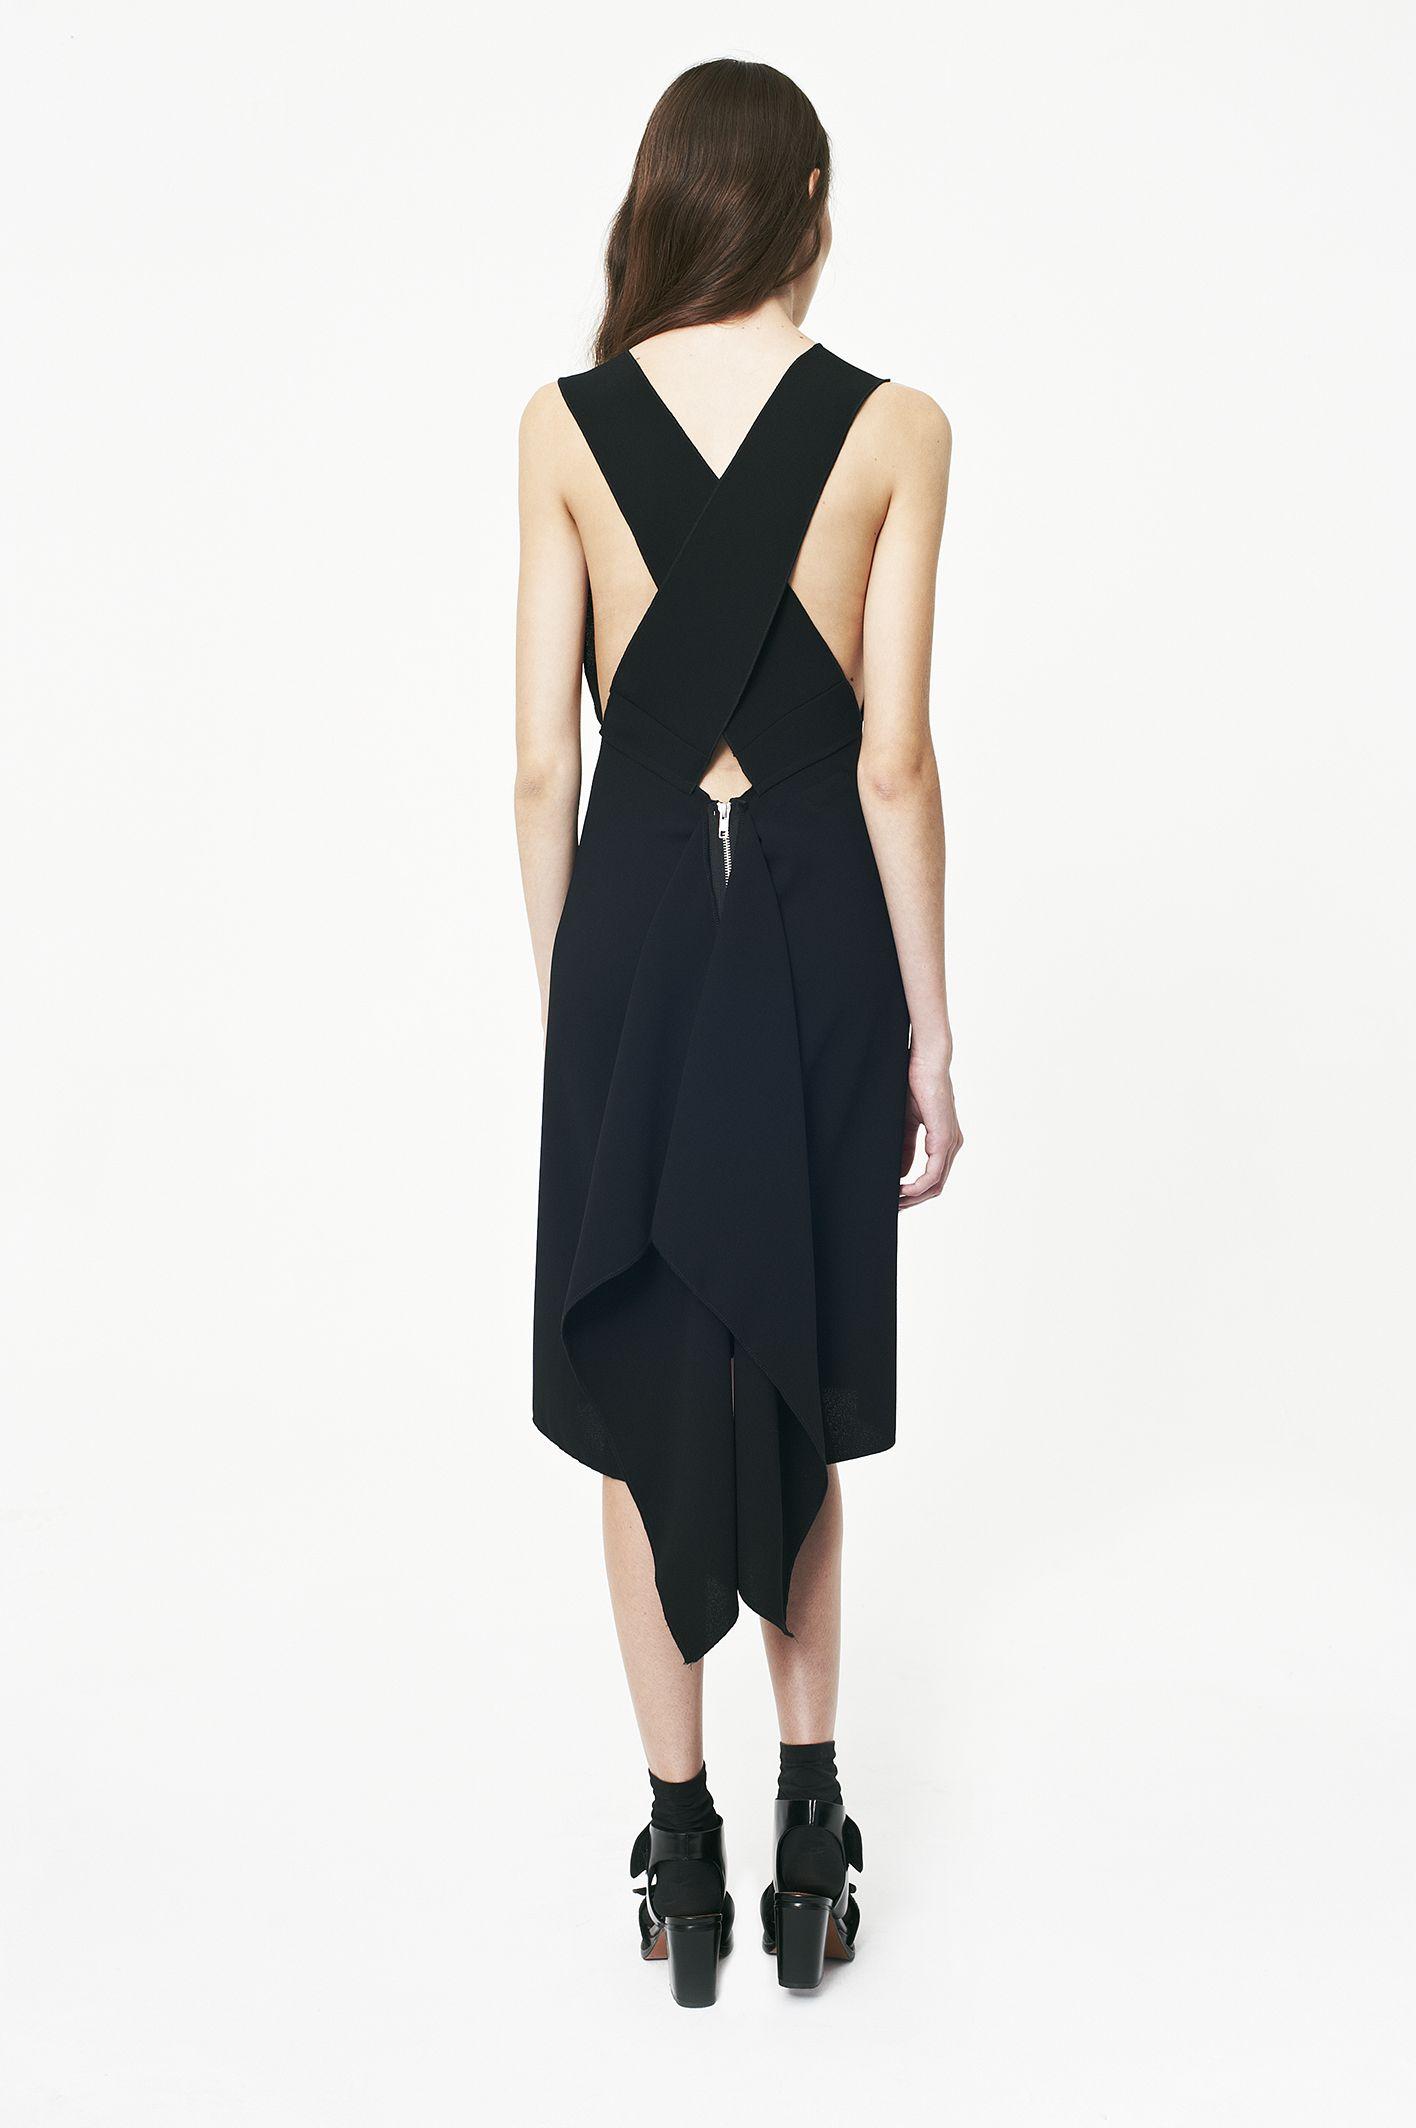 black crepe gorgeous dress ,  cross detail silver metal zip